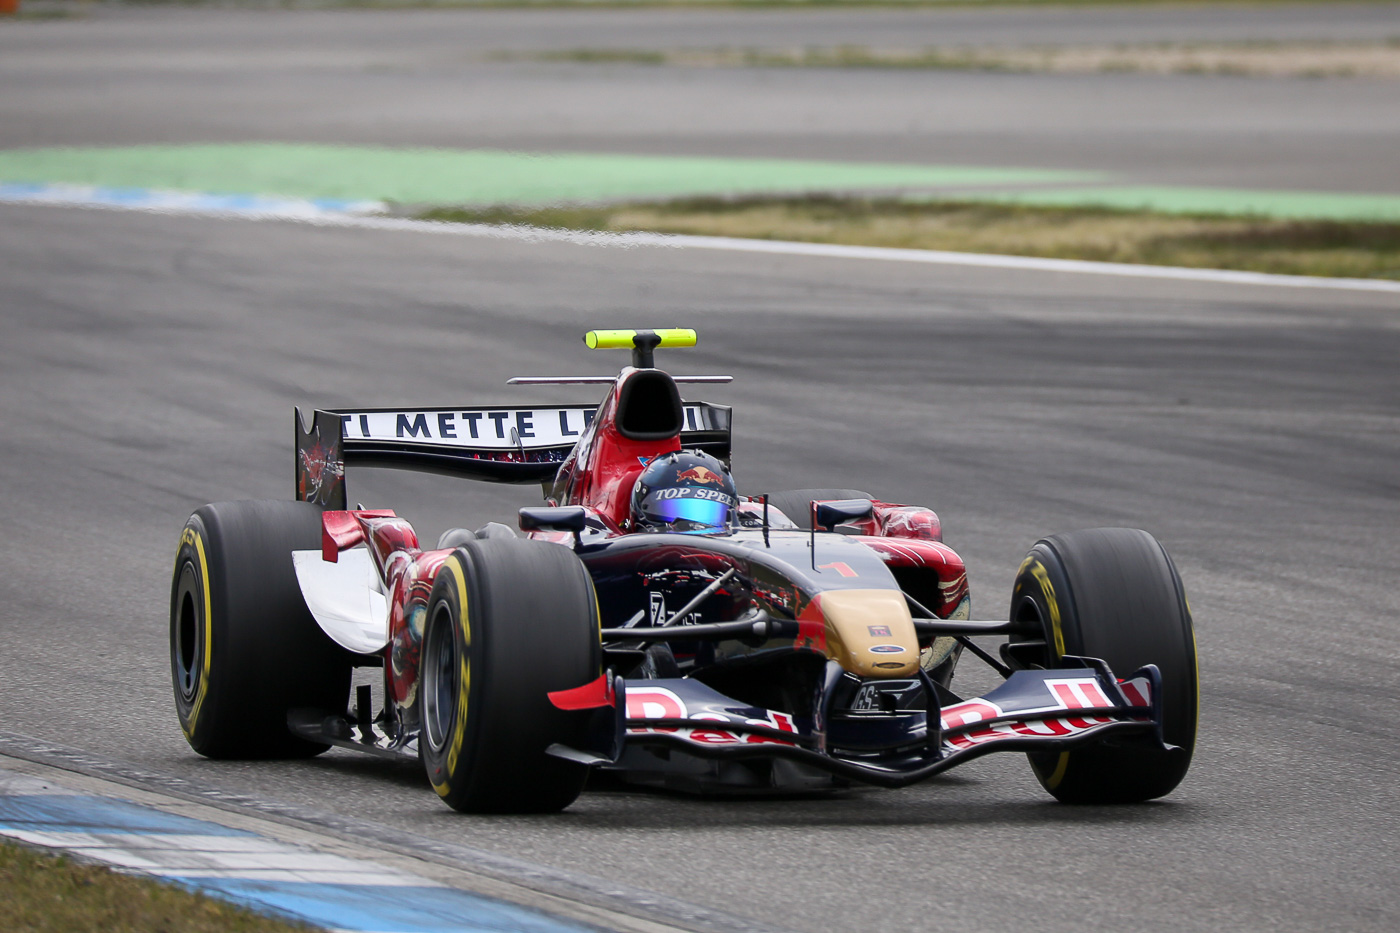 Ingo Gerstl racing a fabulous time during qualifying in Hockenheim 2017.